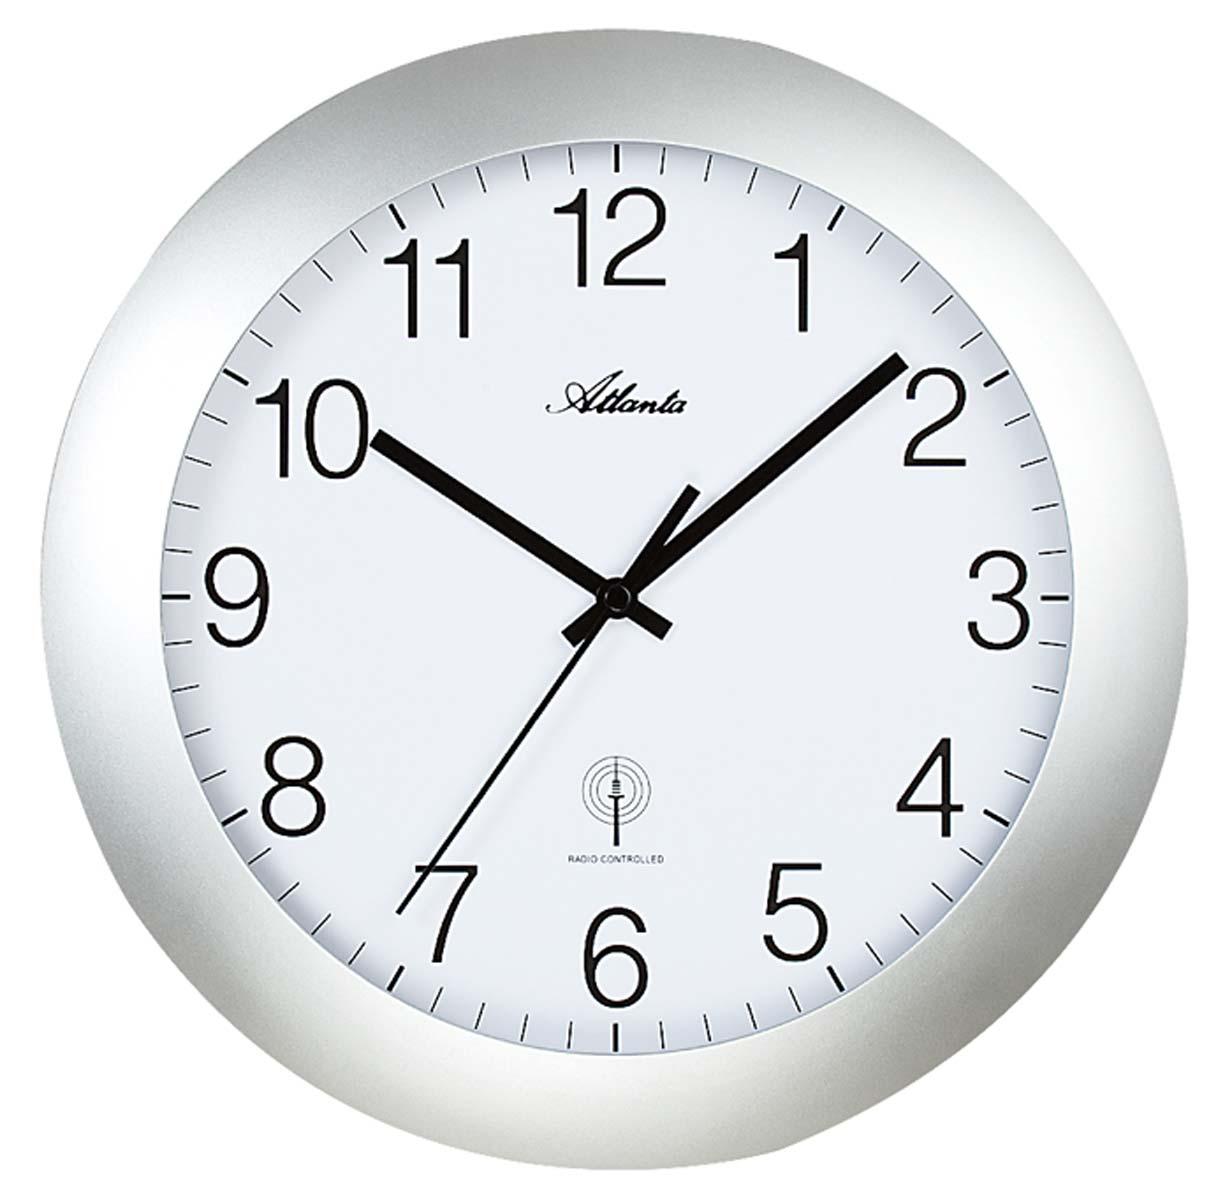 atlanta 4217 19 horloge murale horloge de bureau nouveau ebay. Black Bedroom Furniture Sets. Home Design Ideas